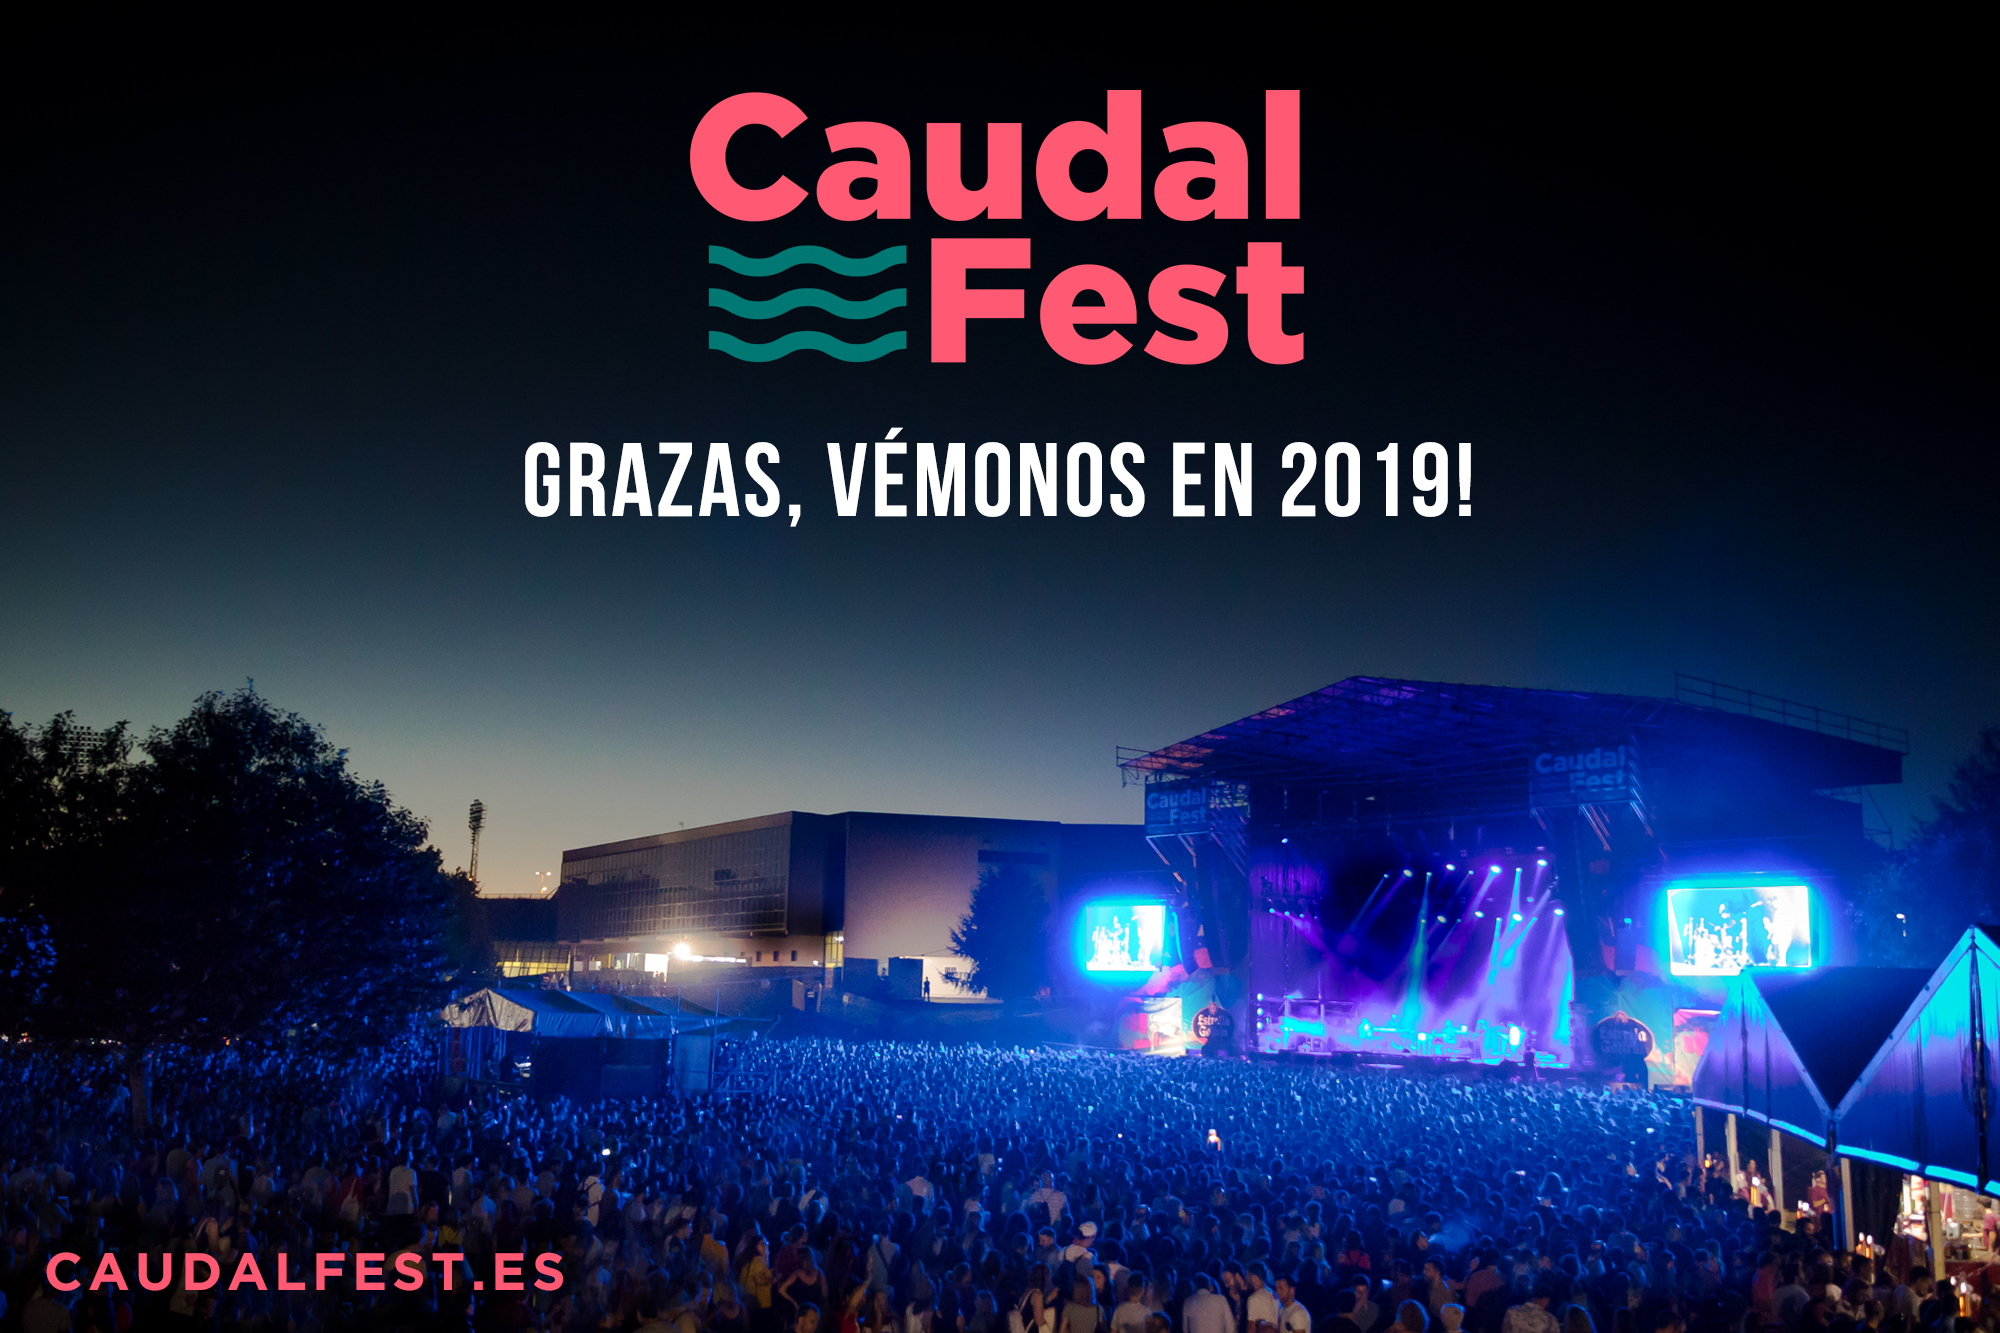 Caudal Fest Gracias